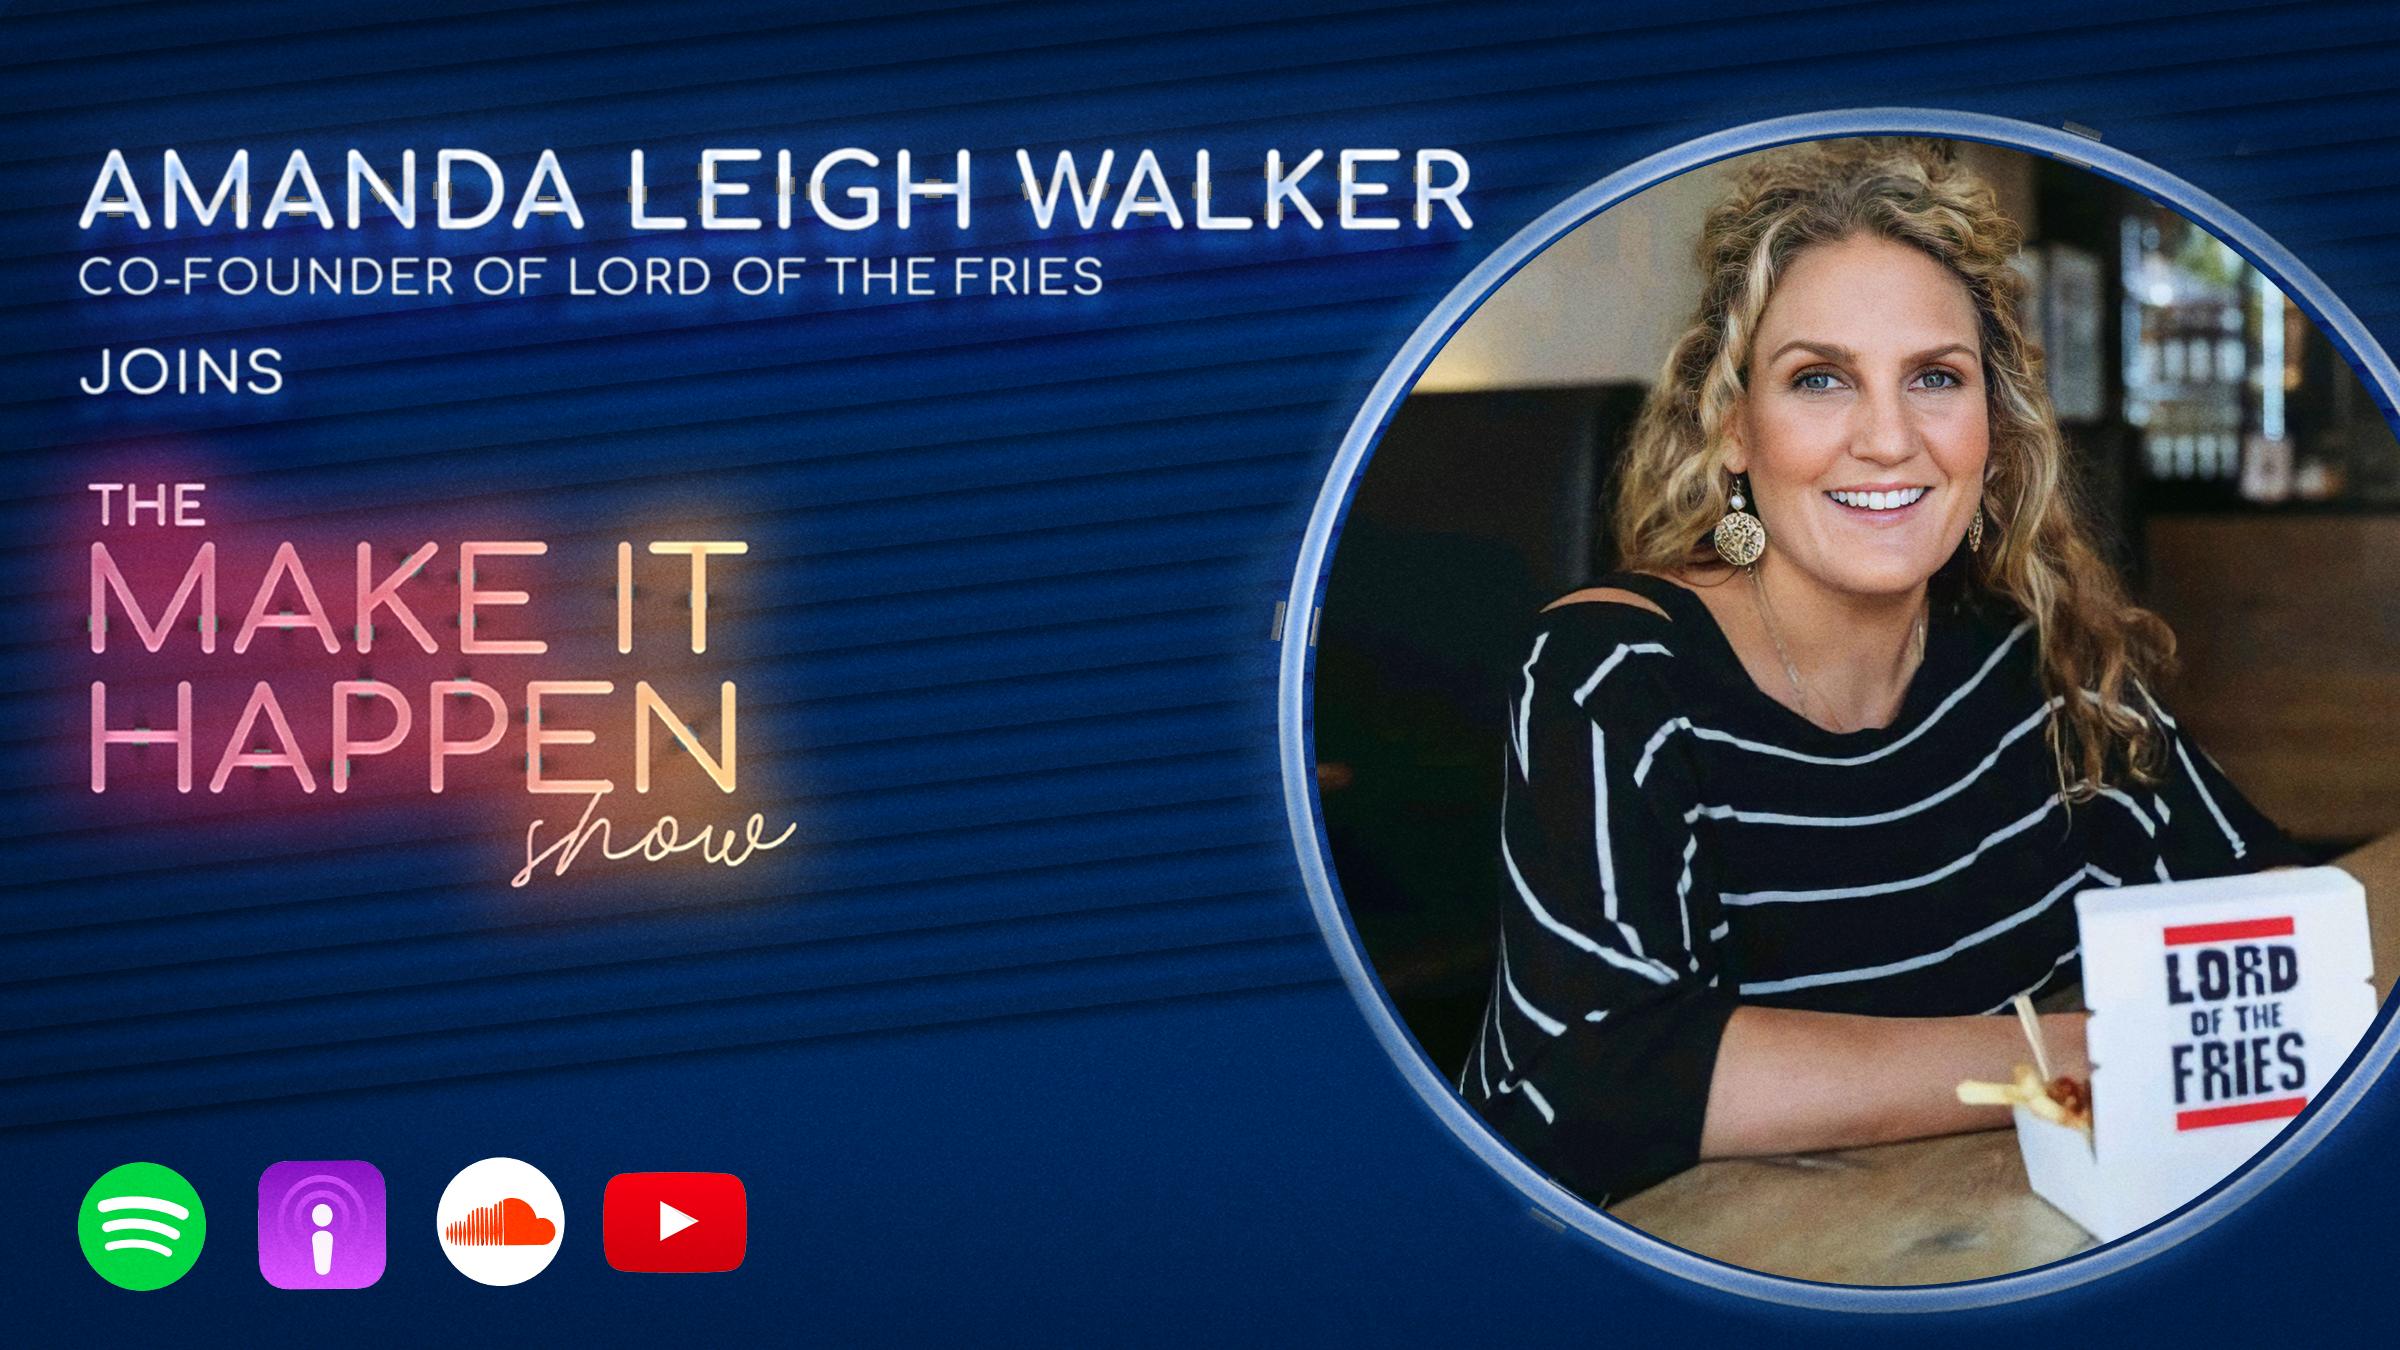 Amanda Leigh Walker joins The Make It Happen Show